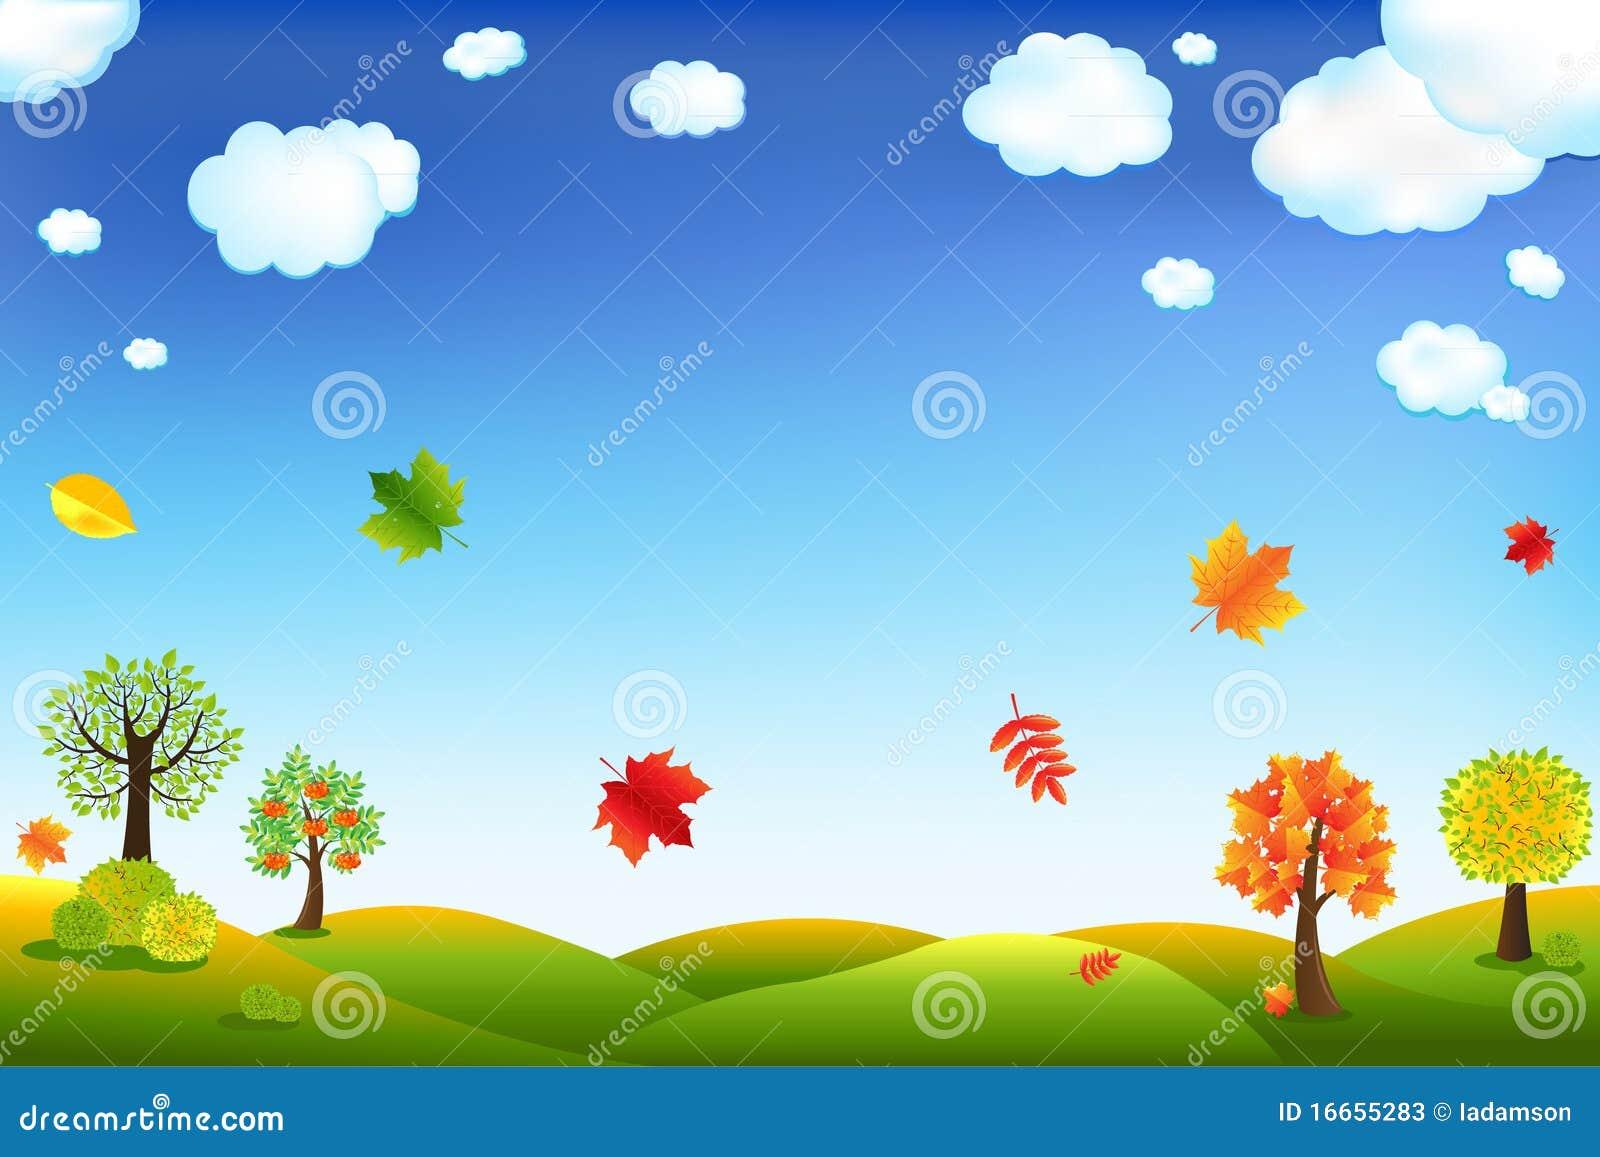 Autumn Cartoon Landscape Vector Stock Photos Image 16655283